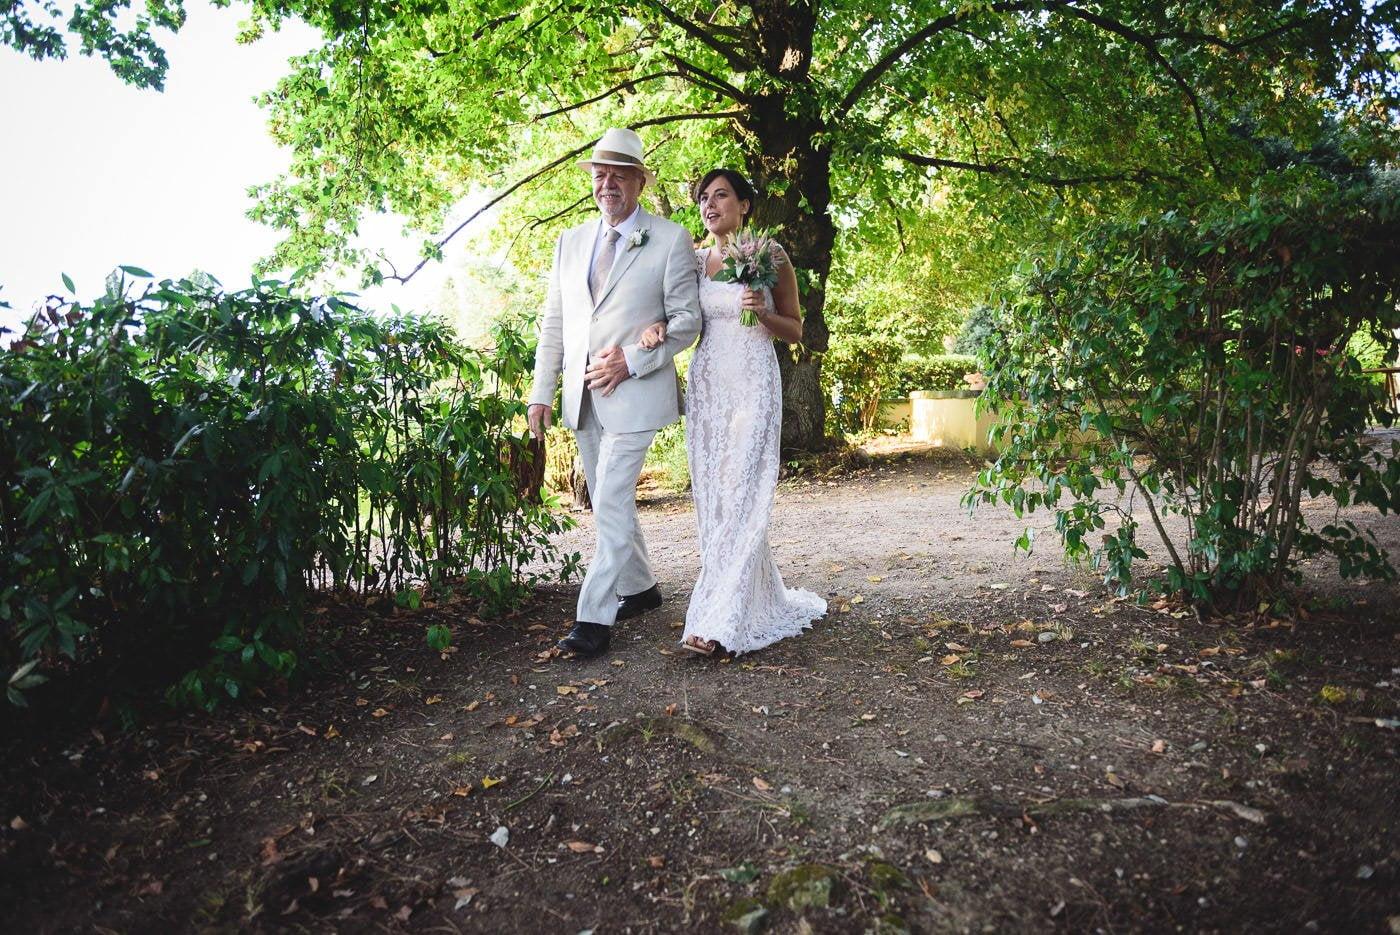 Matrimonio Giulia & Federico 09_15 – Alessio Nobili Photographer-24